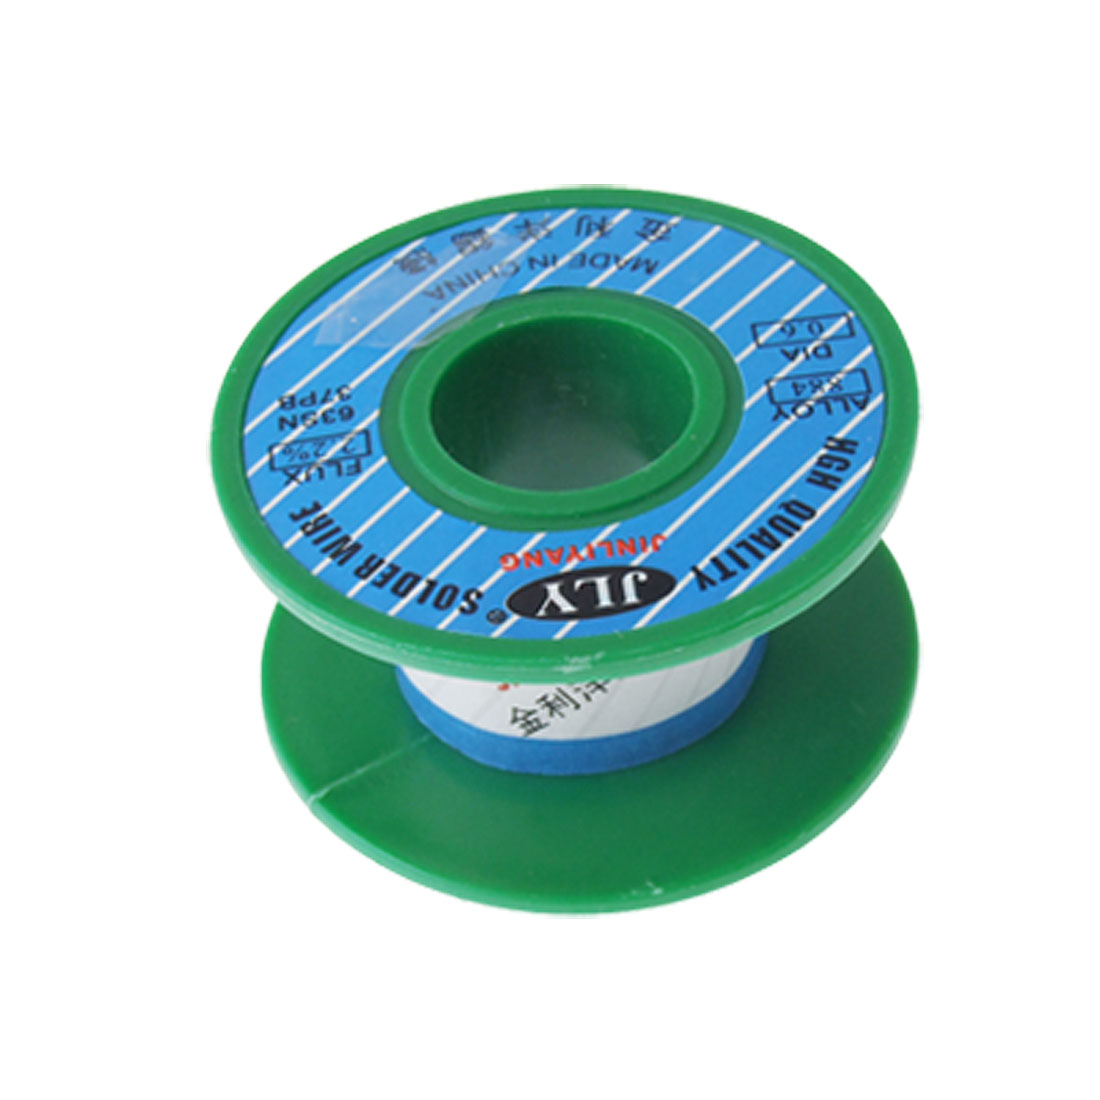 0.6mm Diameter 63/37 Rosin Core Flux 2.2% Tin Lead Roll Solid Solder Wire Reel